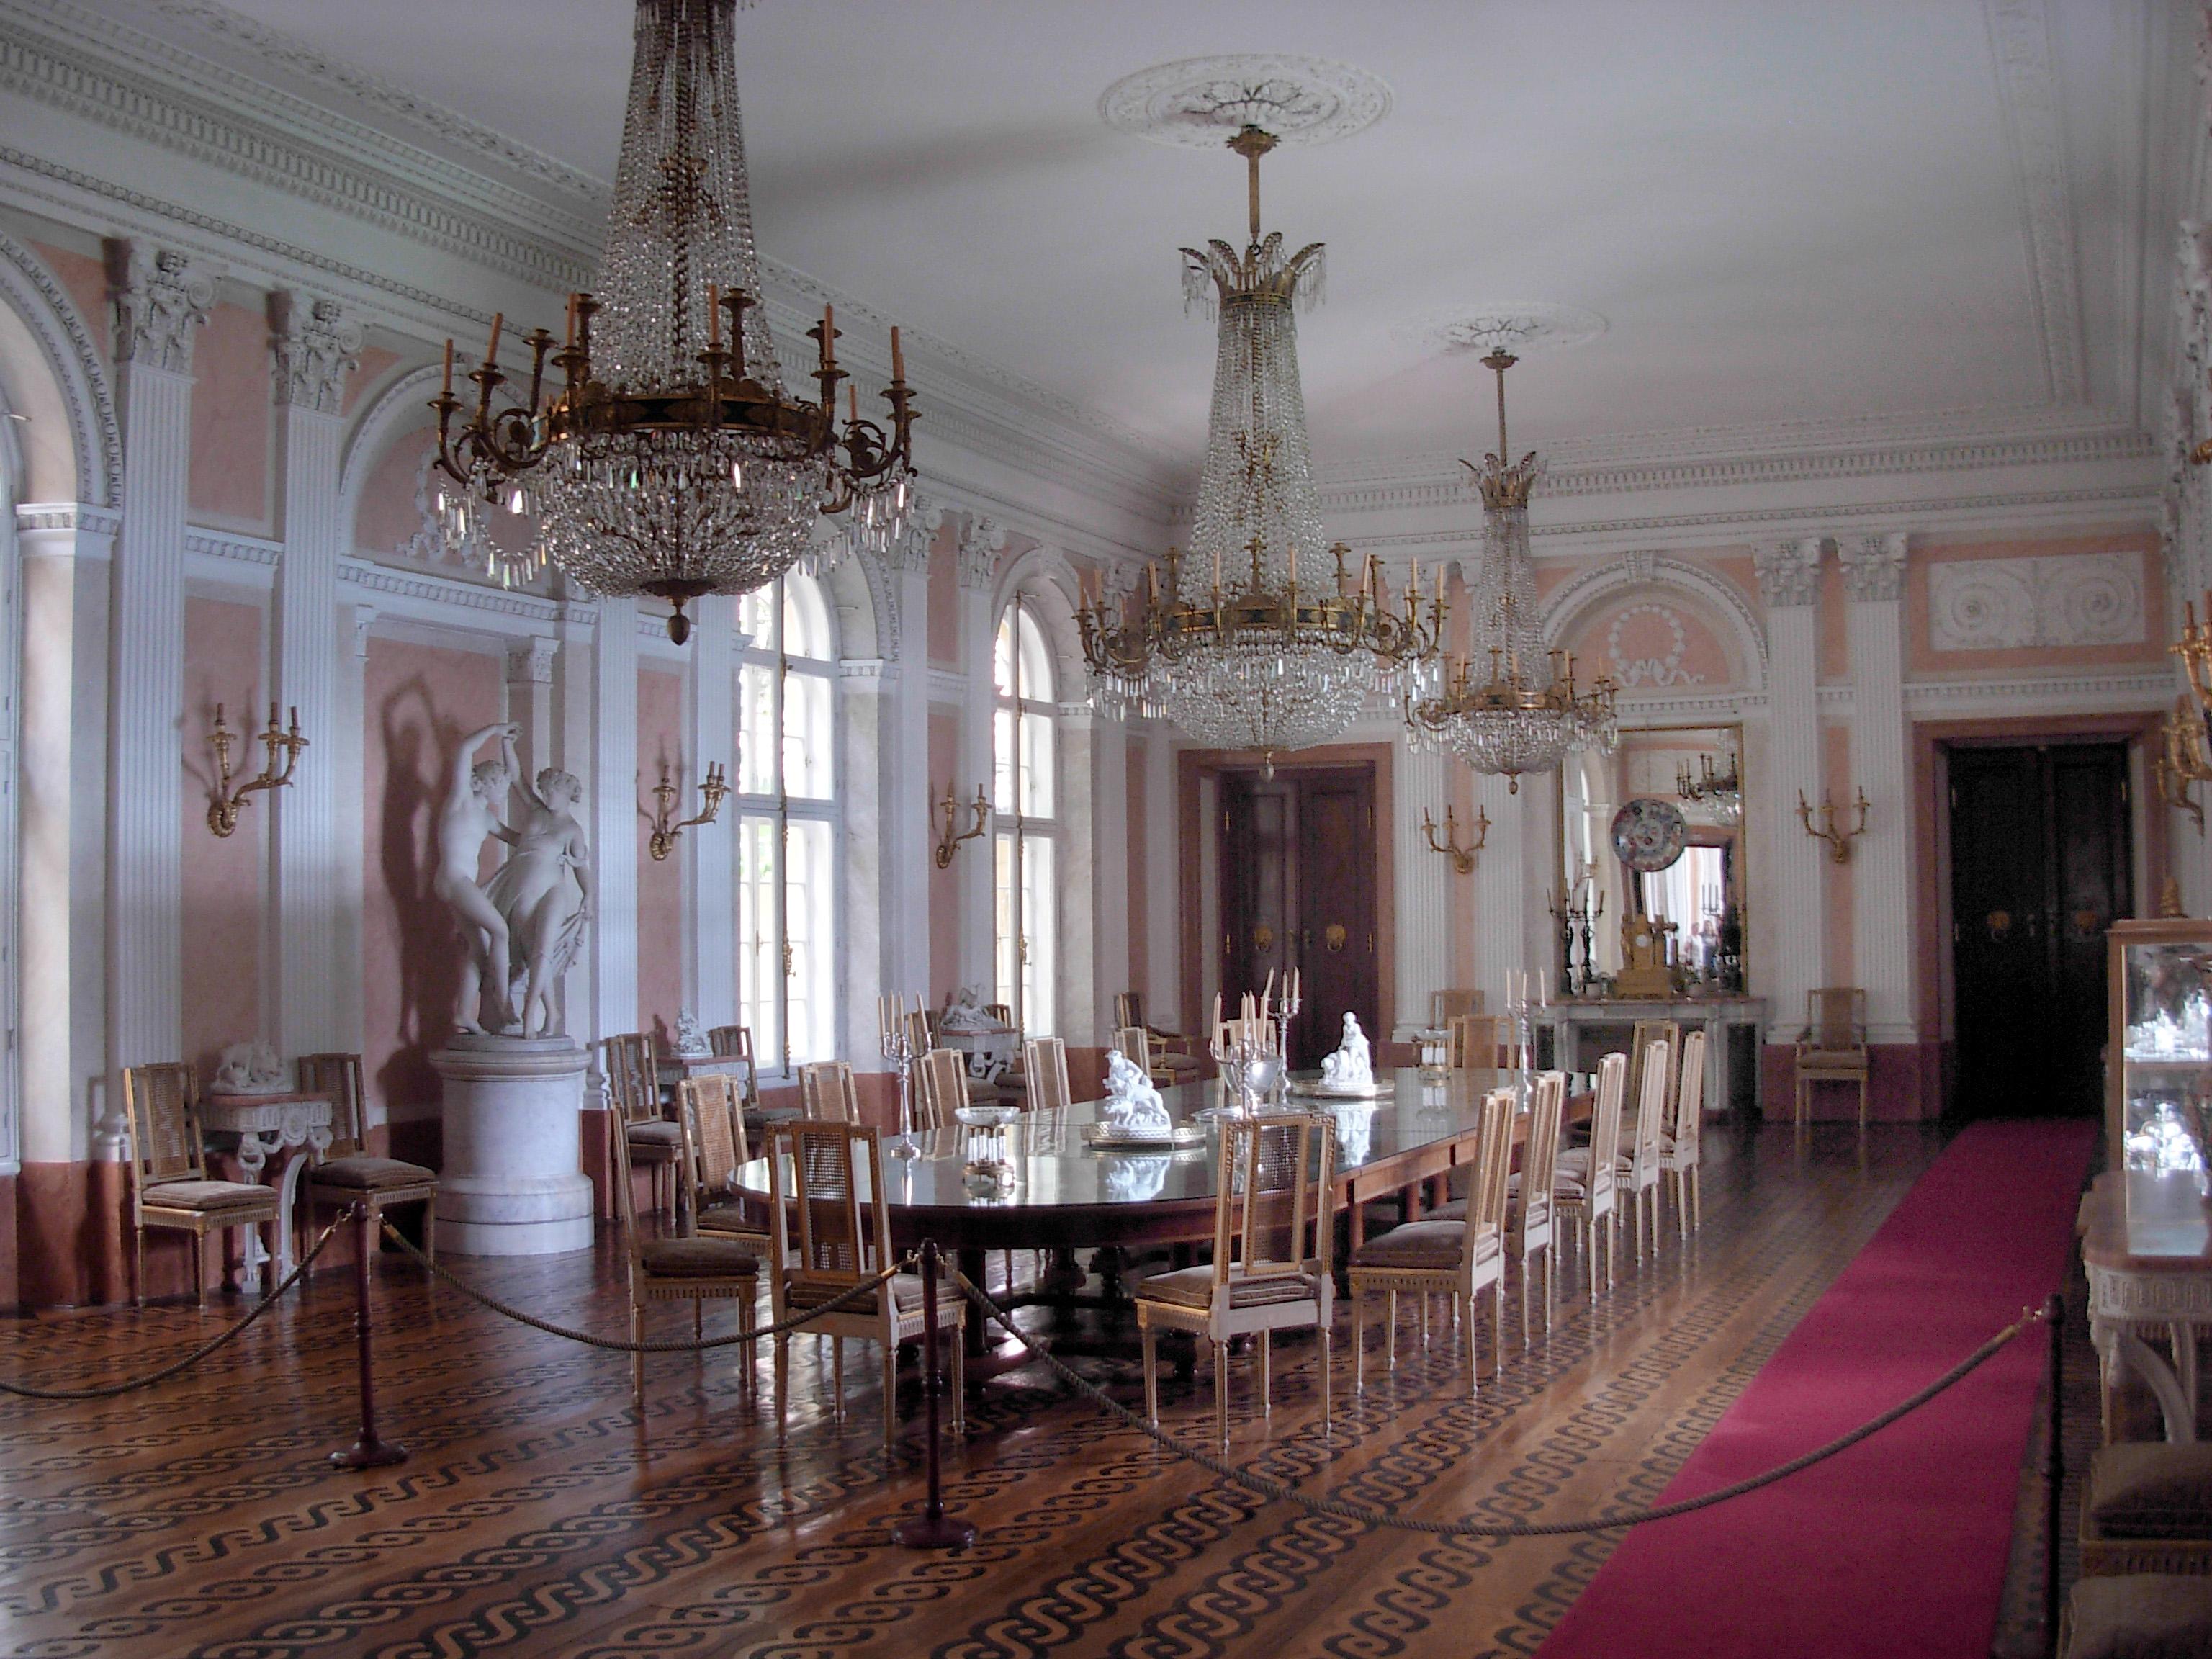 File:Łańcut Palace - inside 06.JPG - Wikimedia Commons